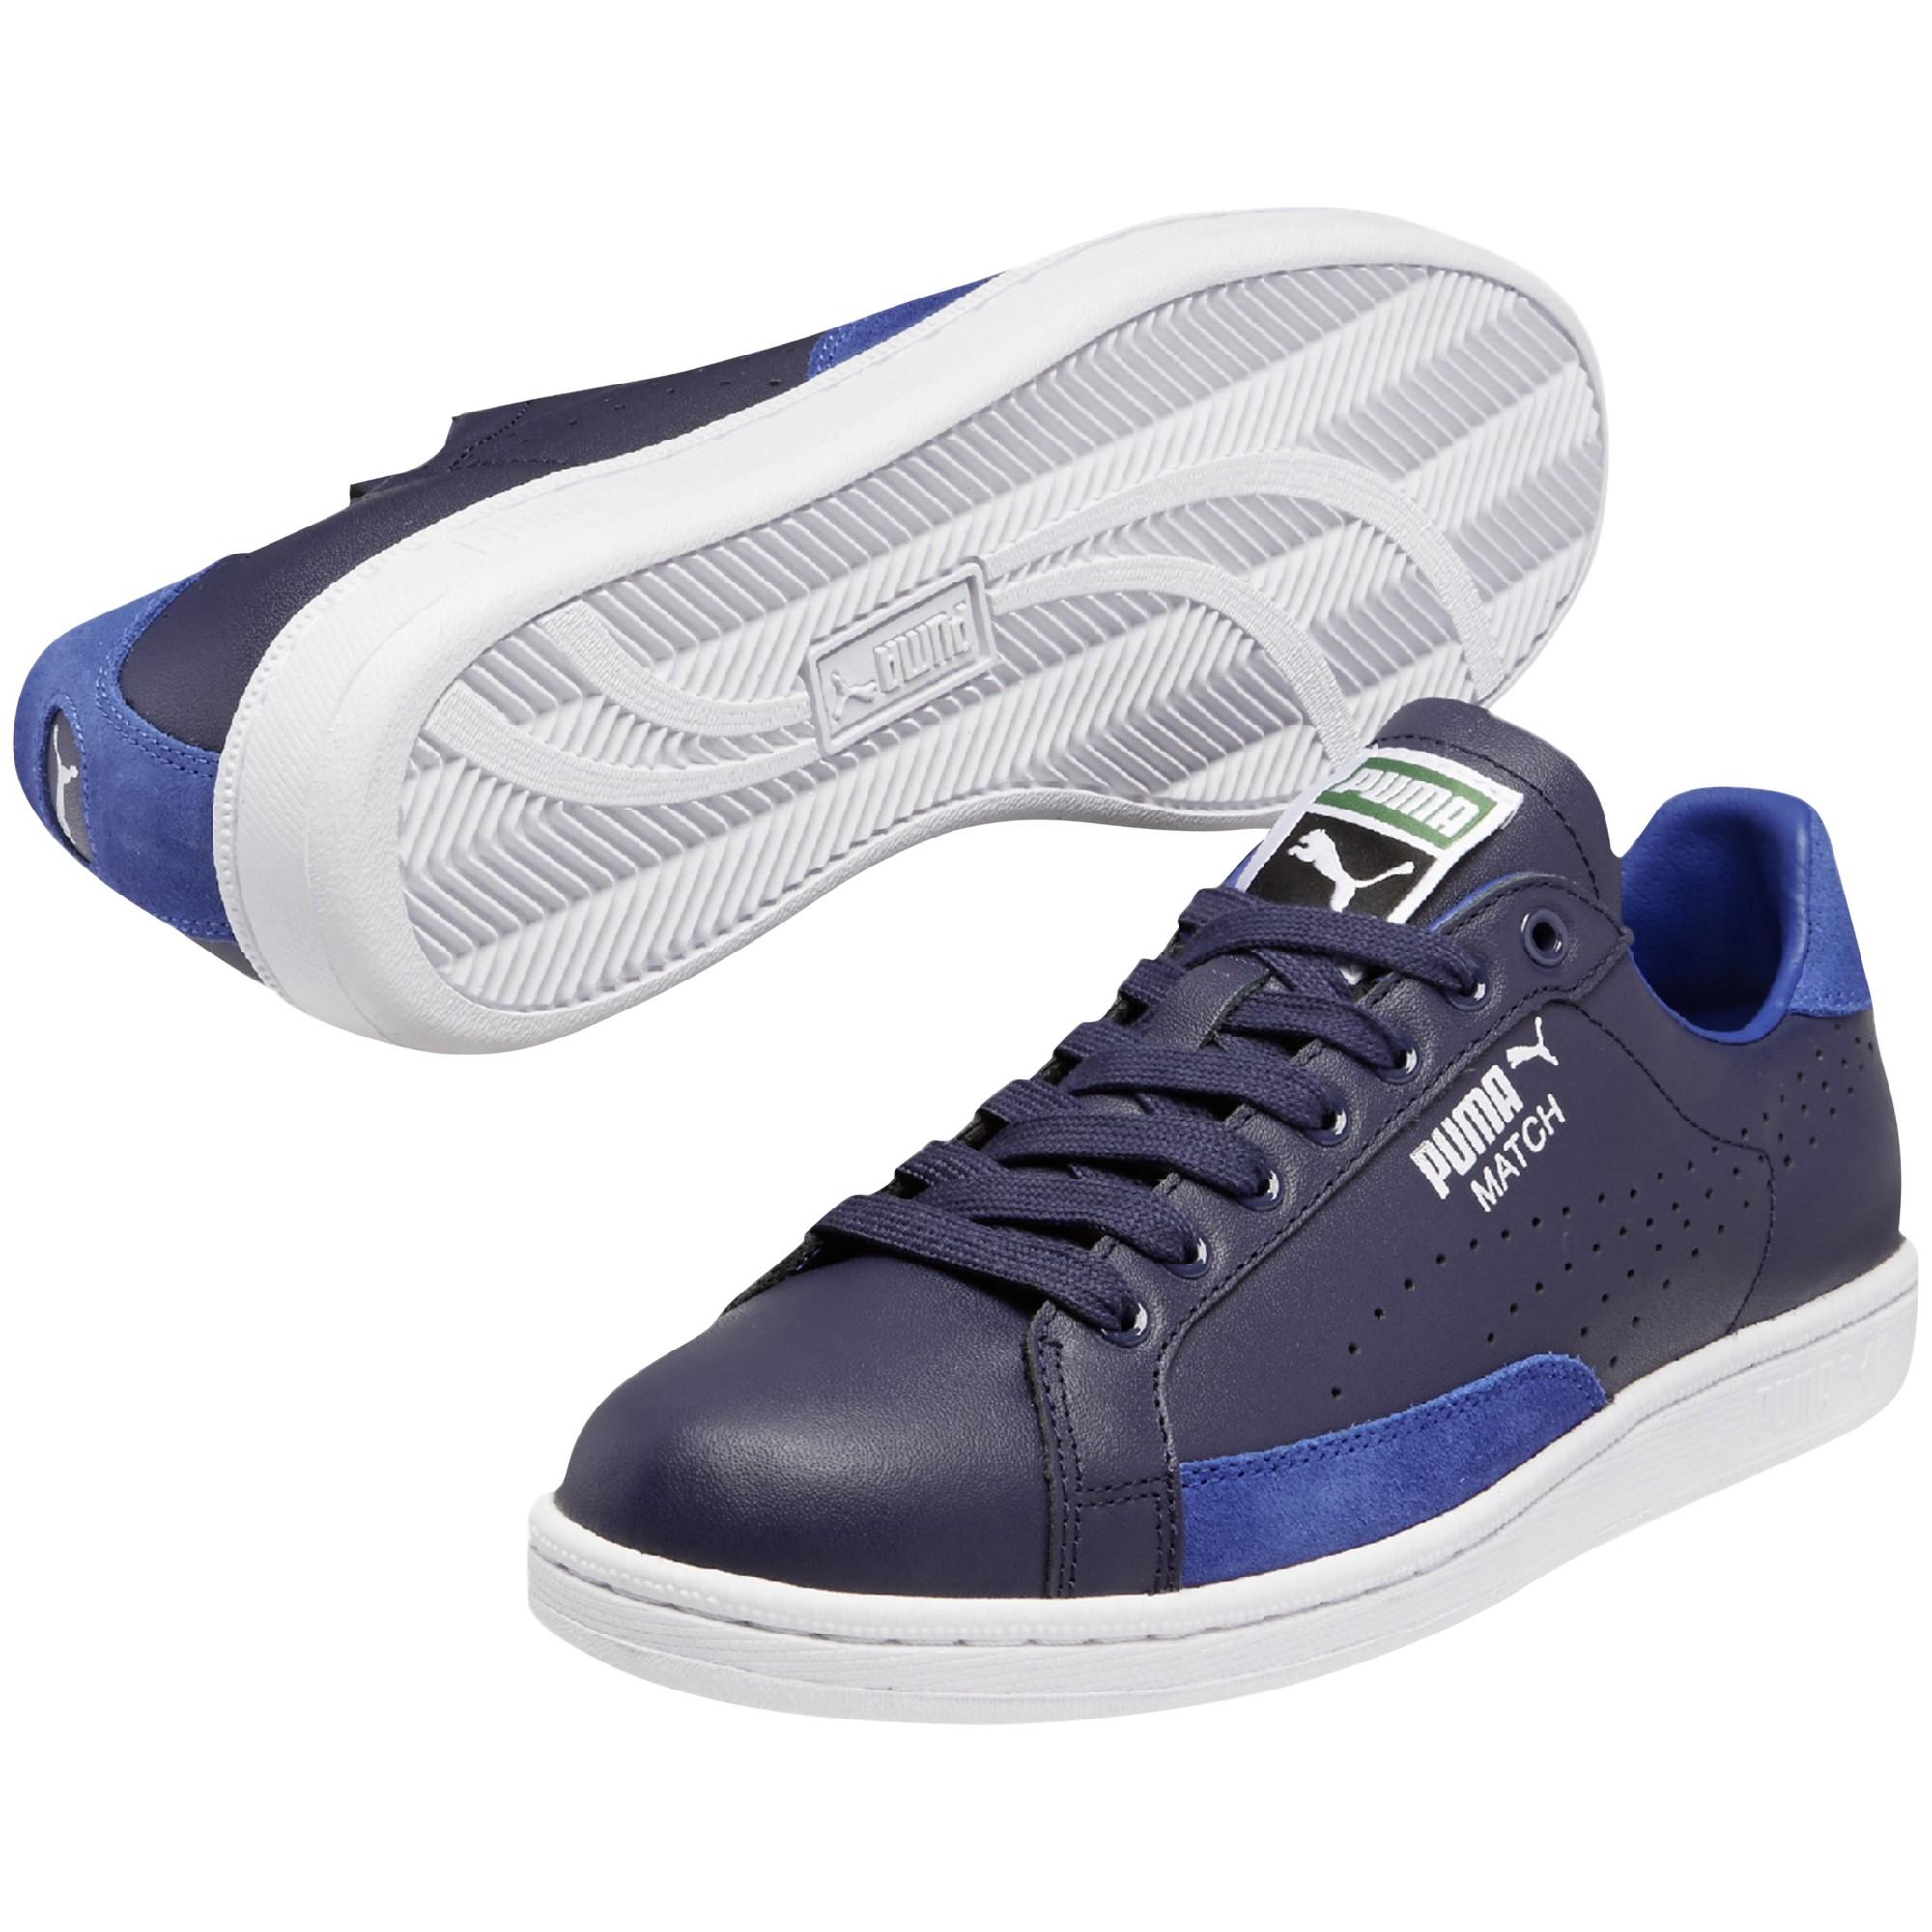 b01bab170cd2a3 PUMA Match 74 Leather Trainers in Blue - Lyst